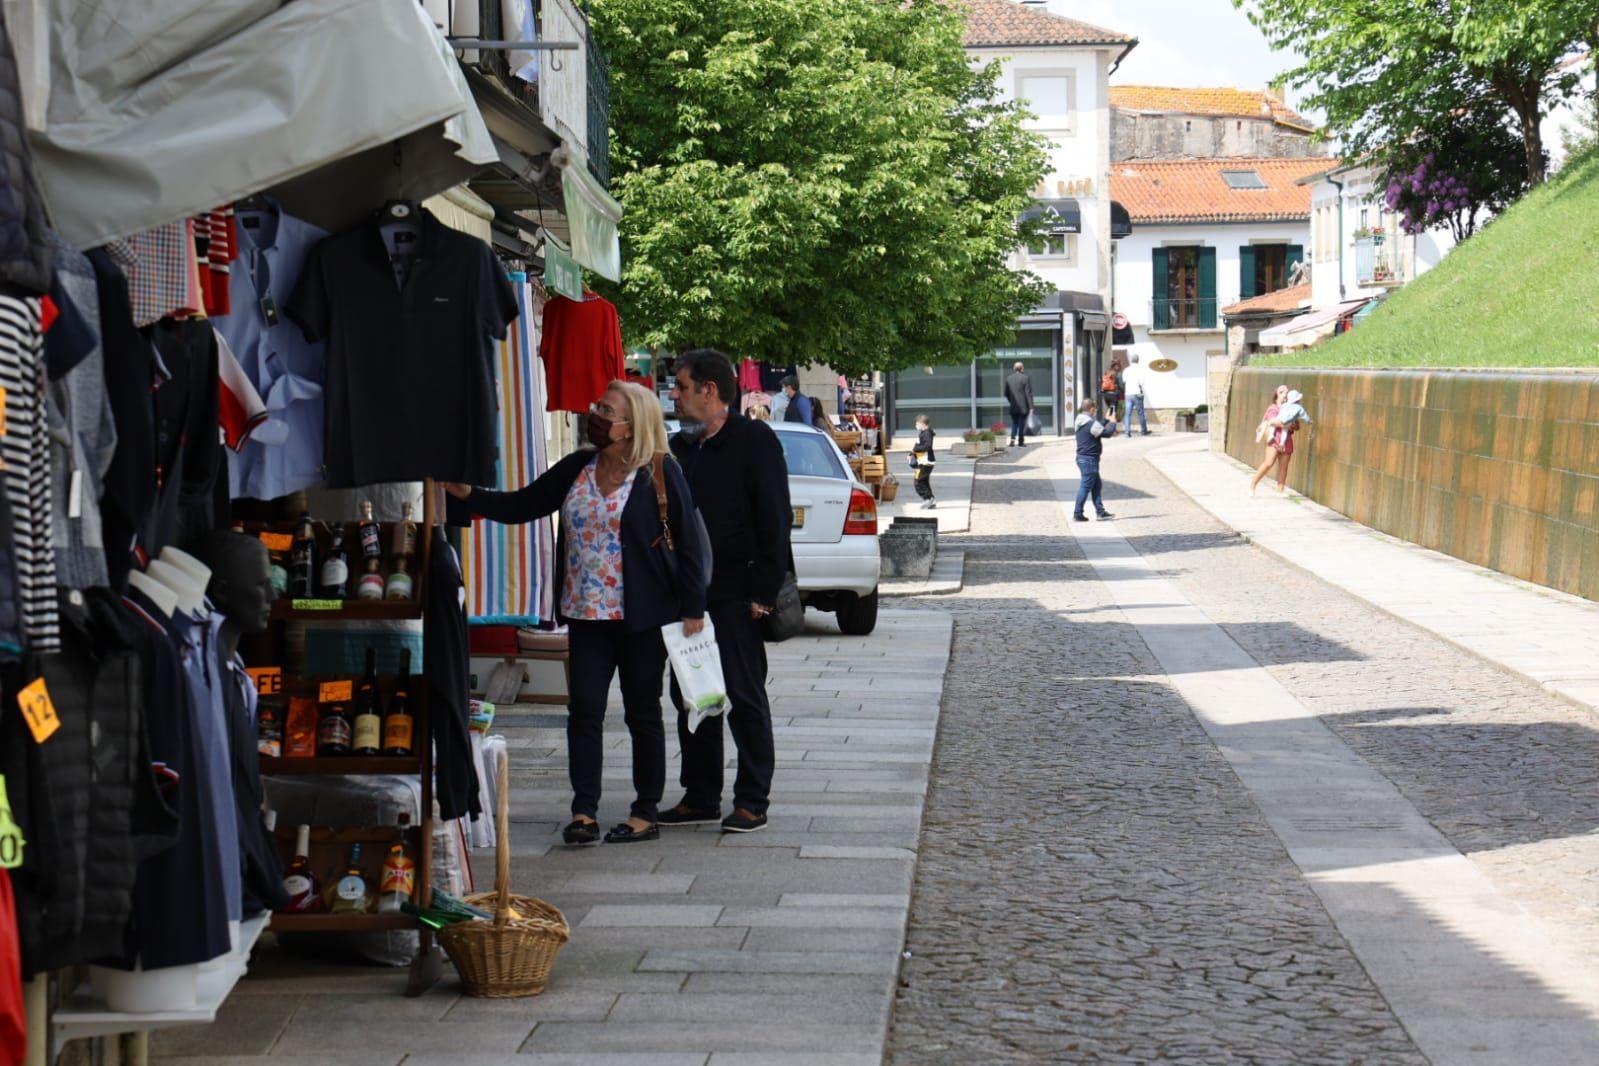 Tranquilidad en Valença en la primera jornada tras la reapertura fronteriza